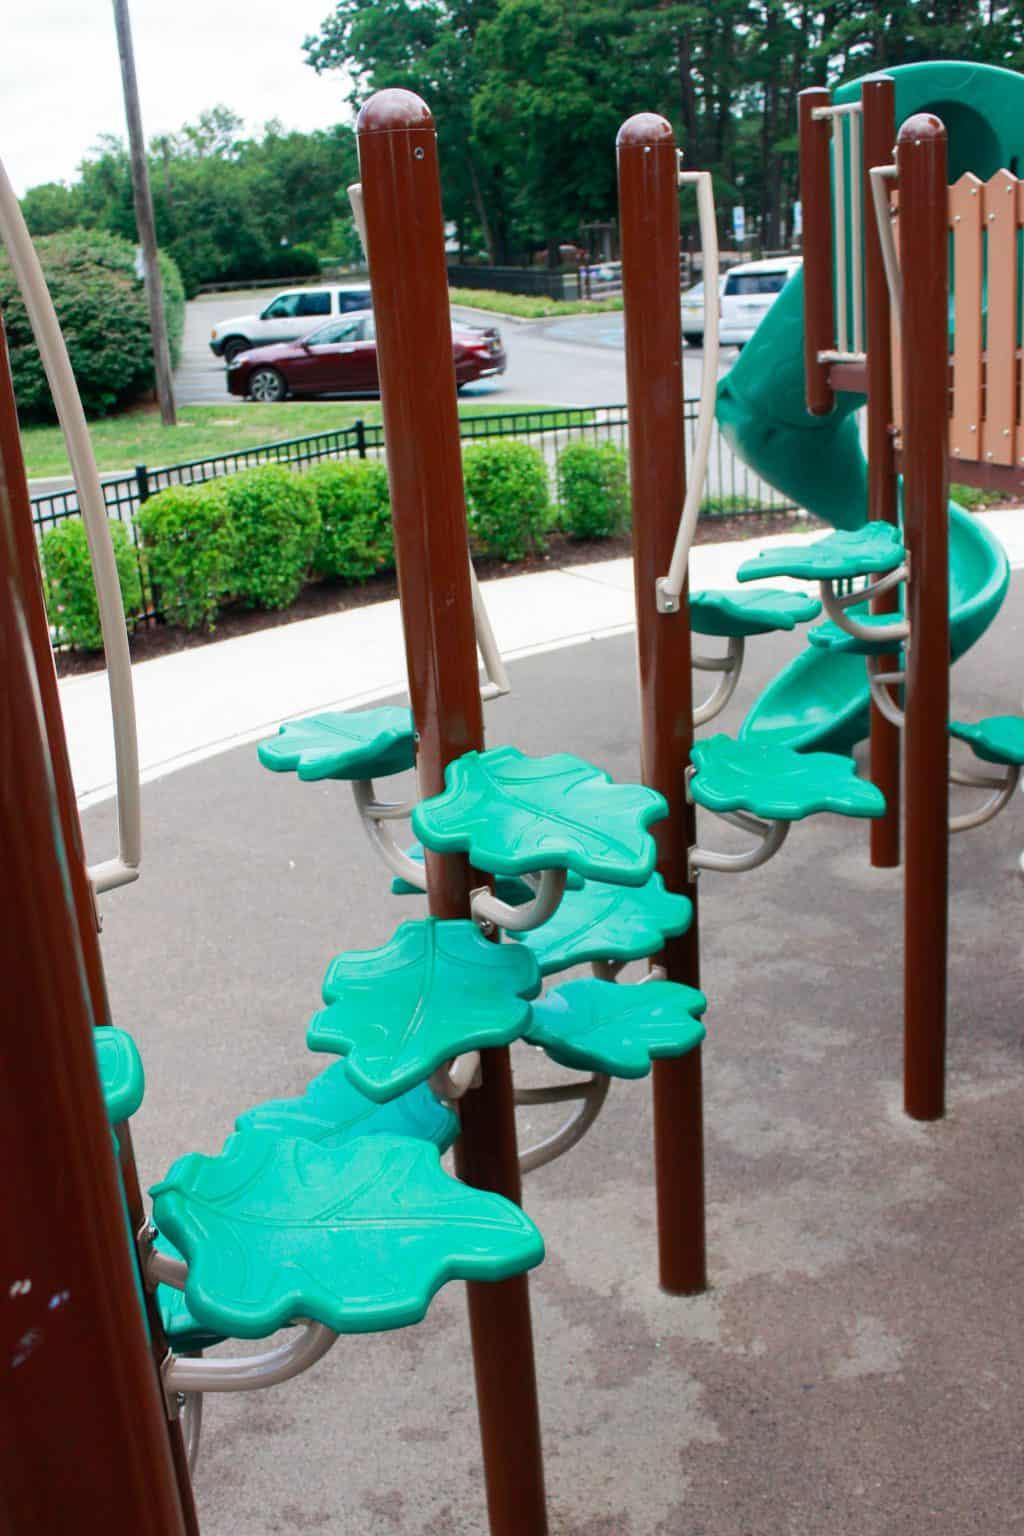 windward-beach-park-playground-brick-nj_28266702815_o-1024x1536